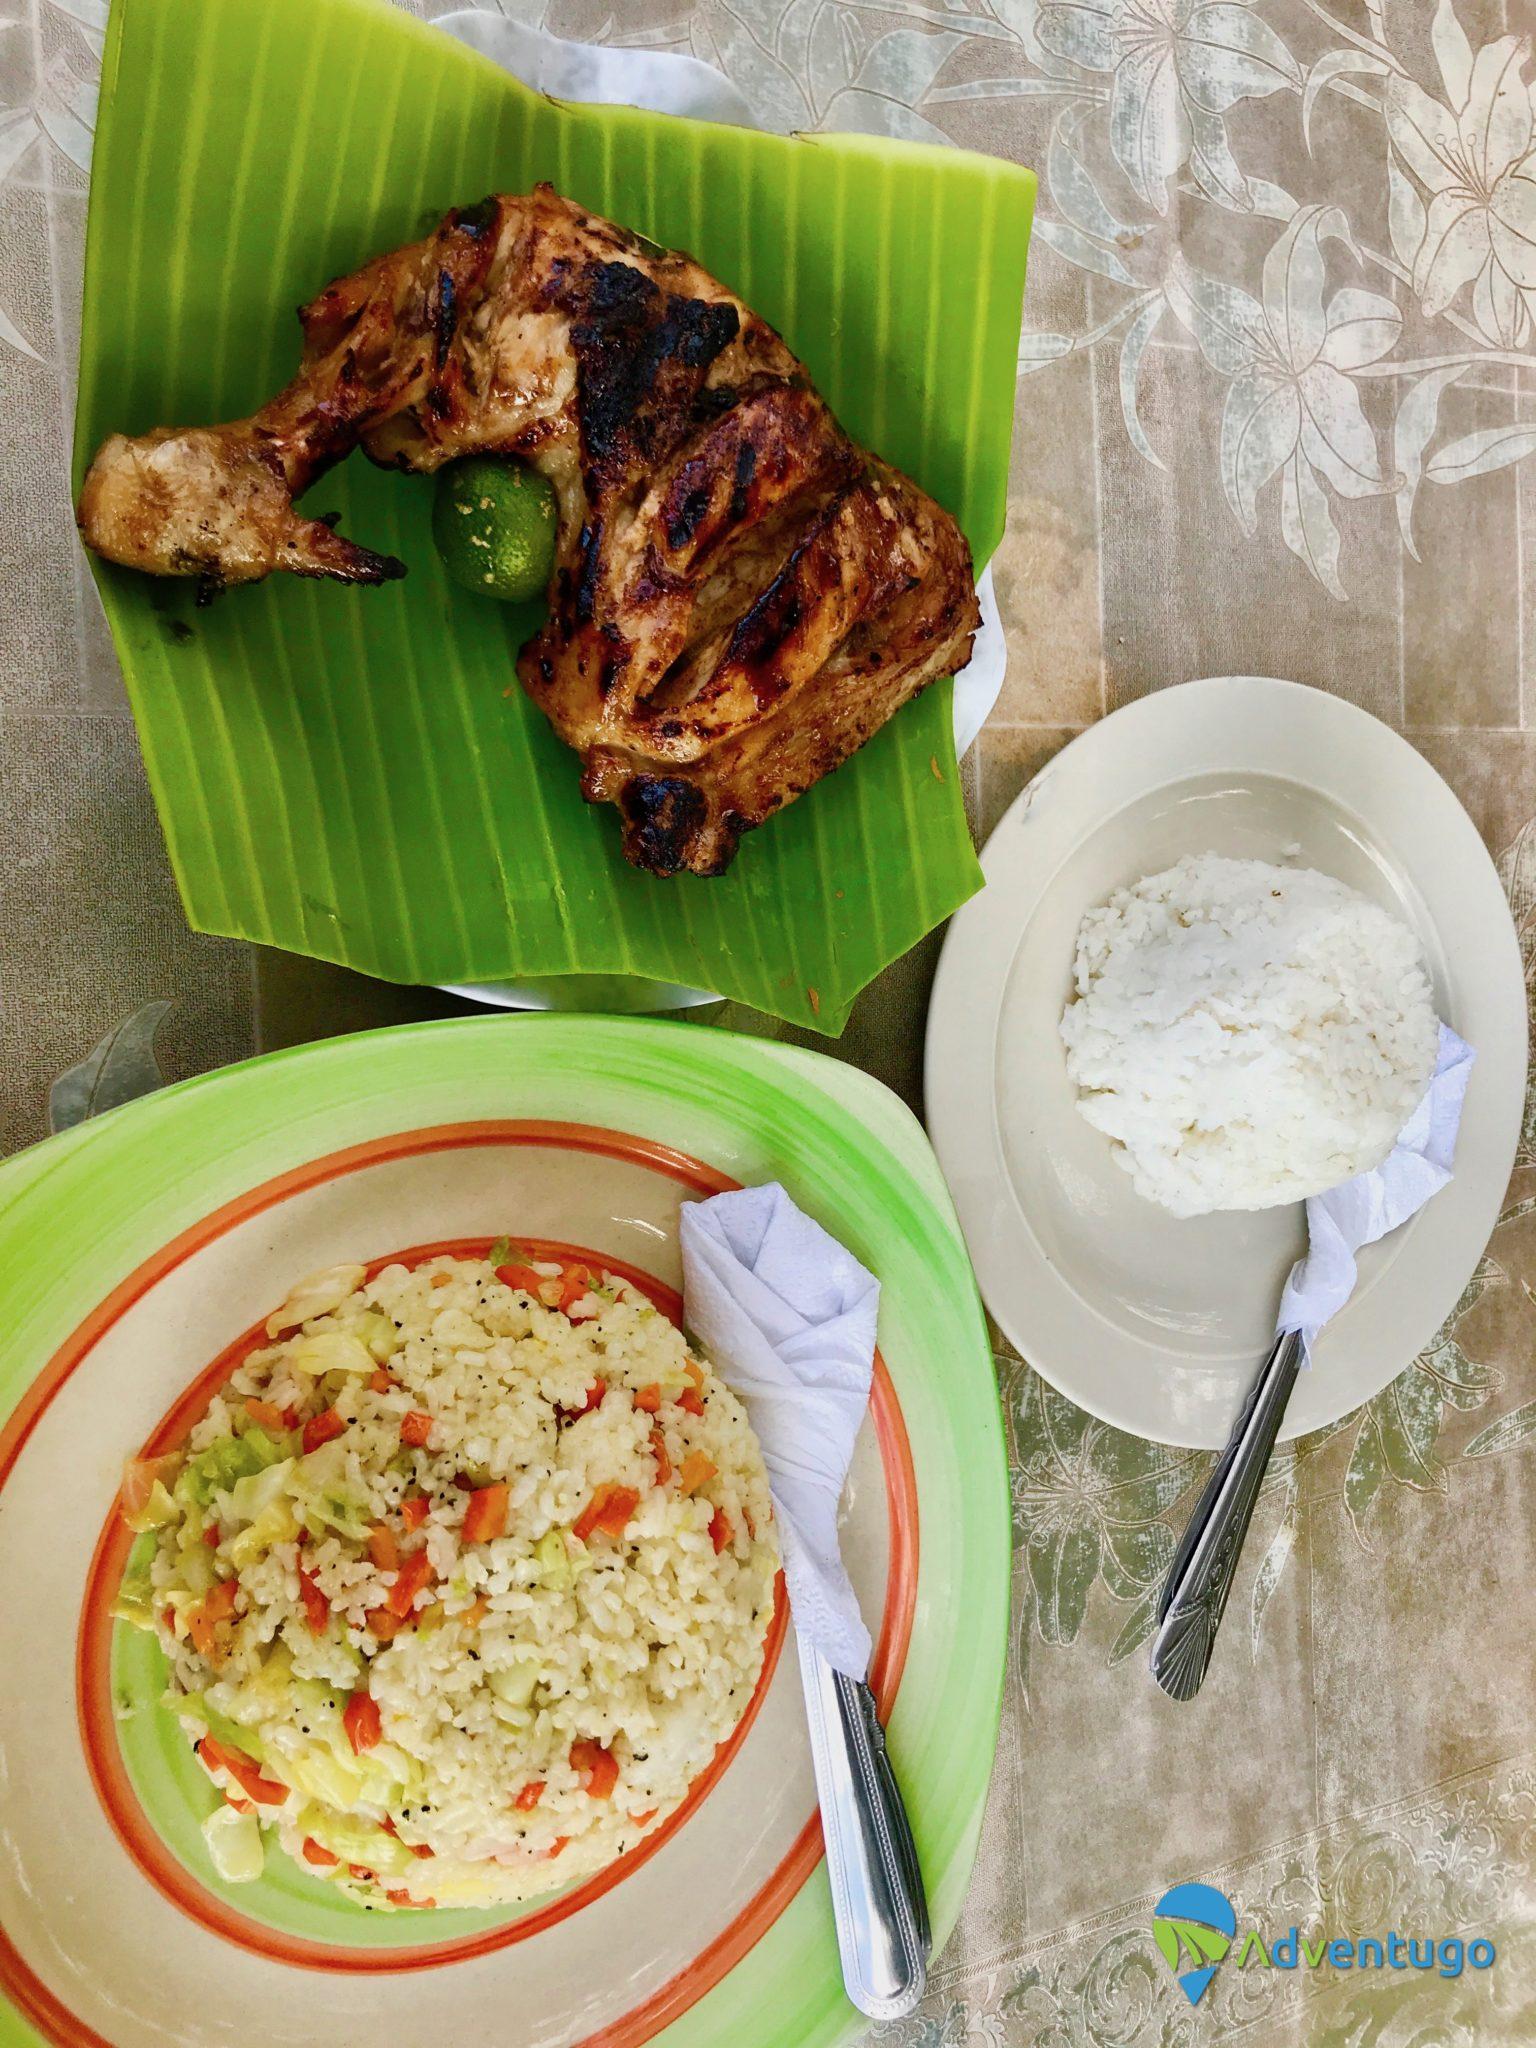 BBq Chicken and Garlic rice Filippino style in El Nido, Philippines food